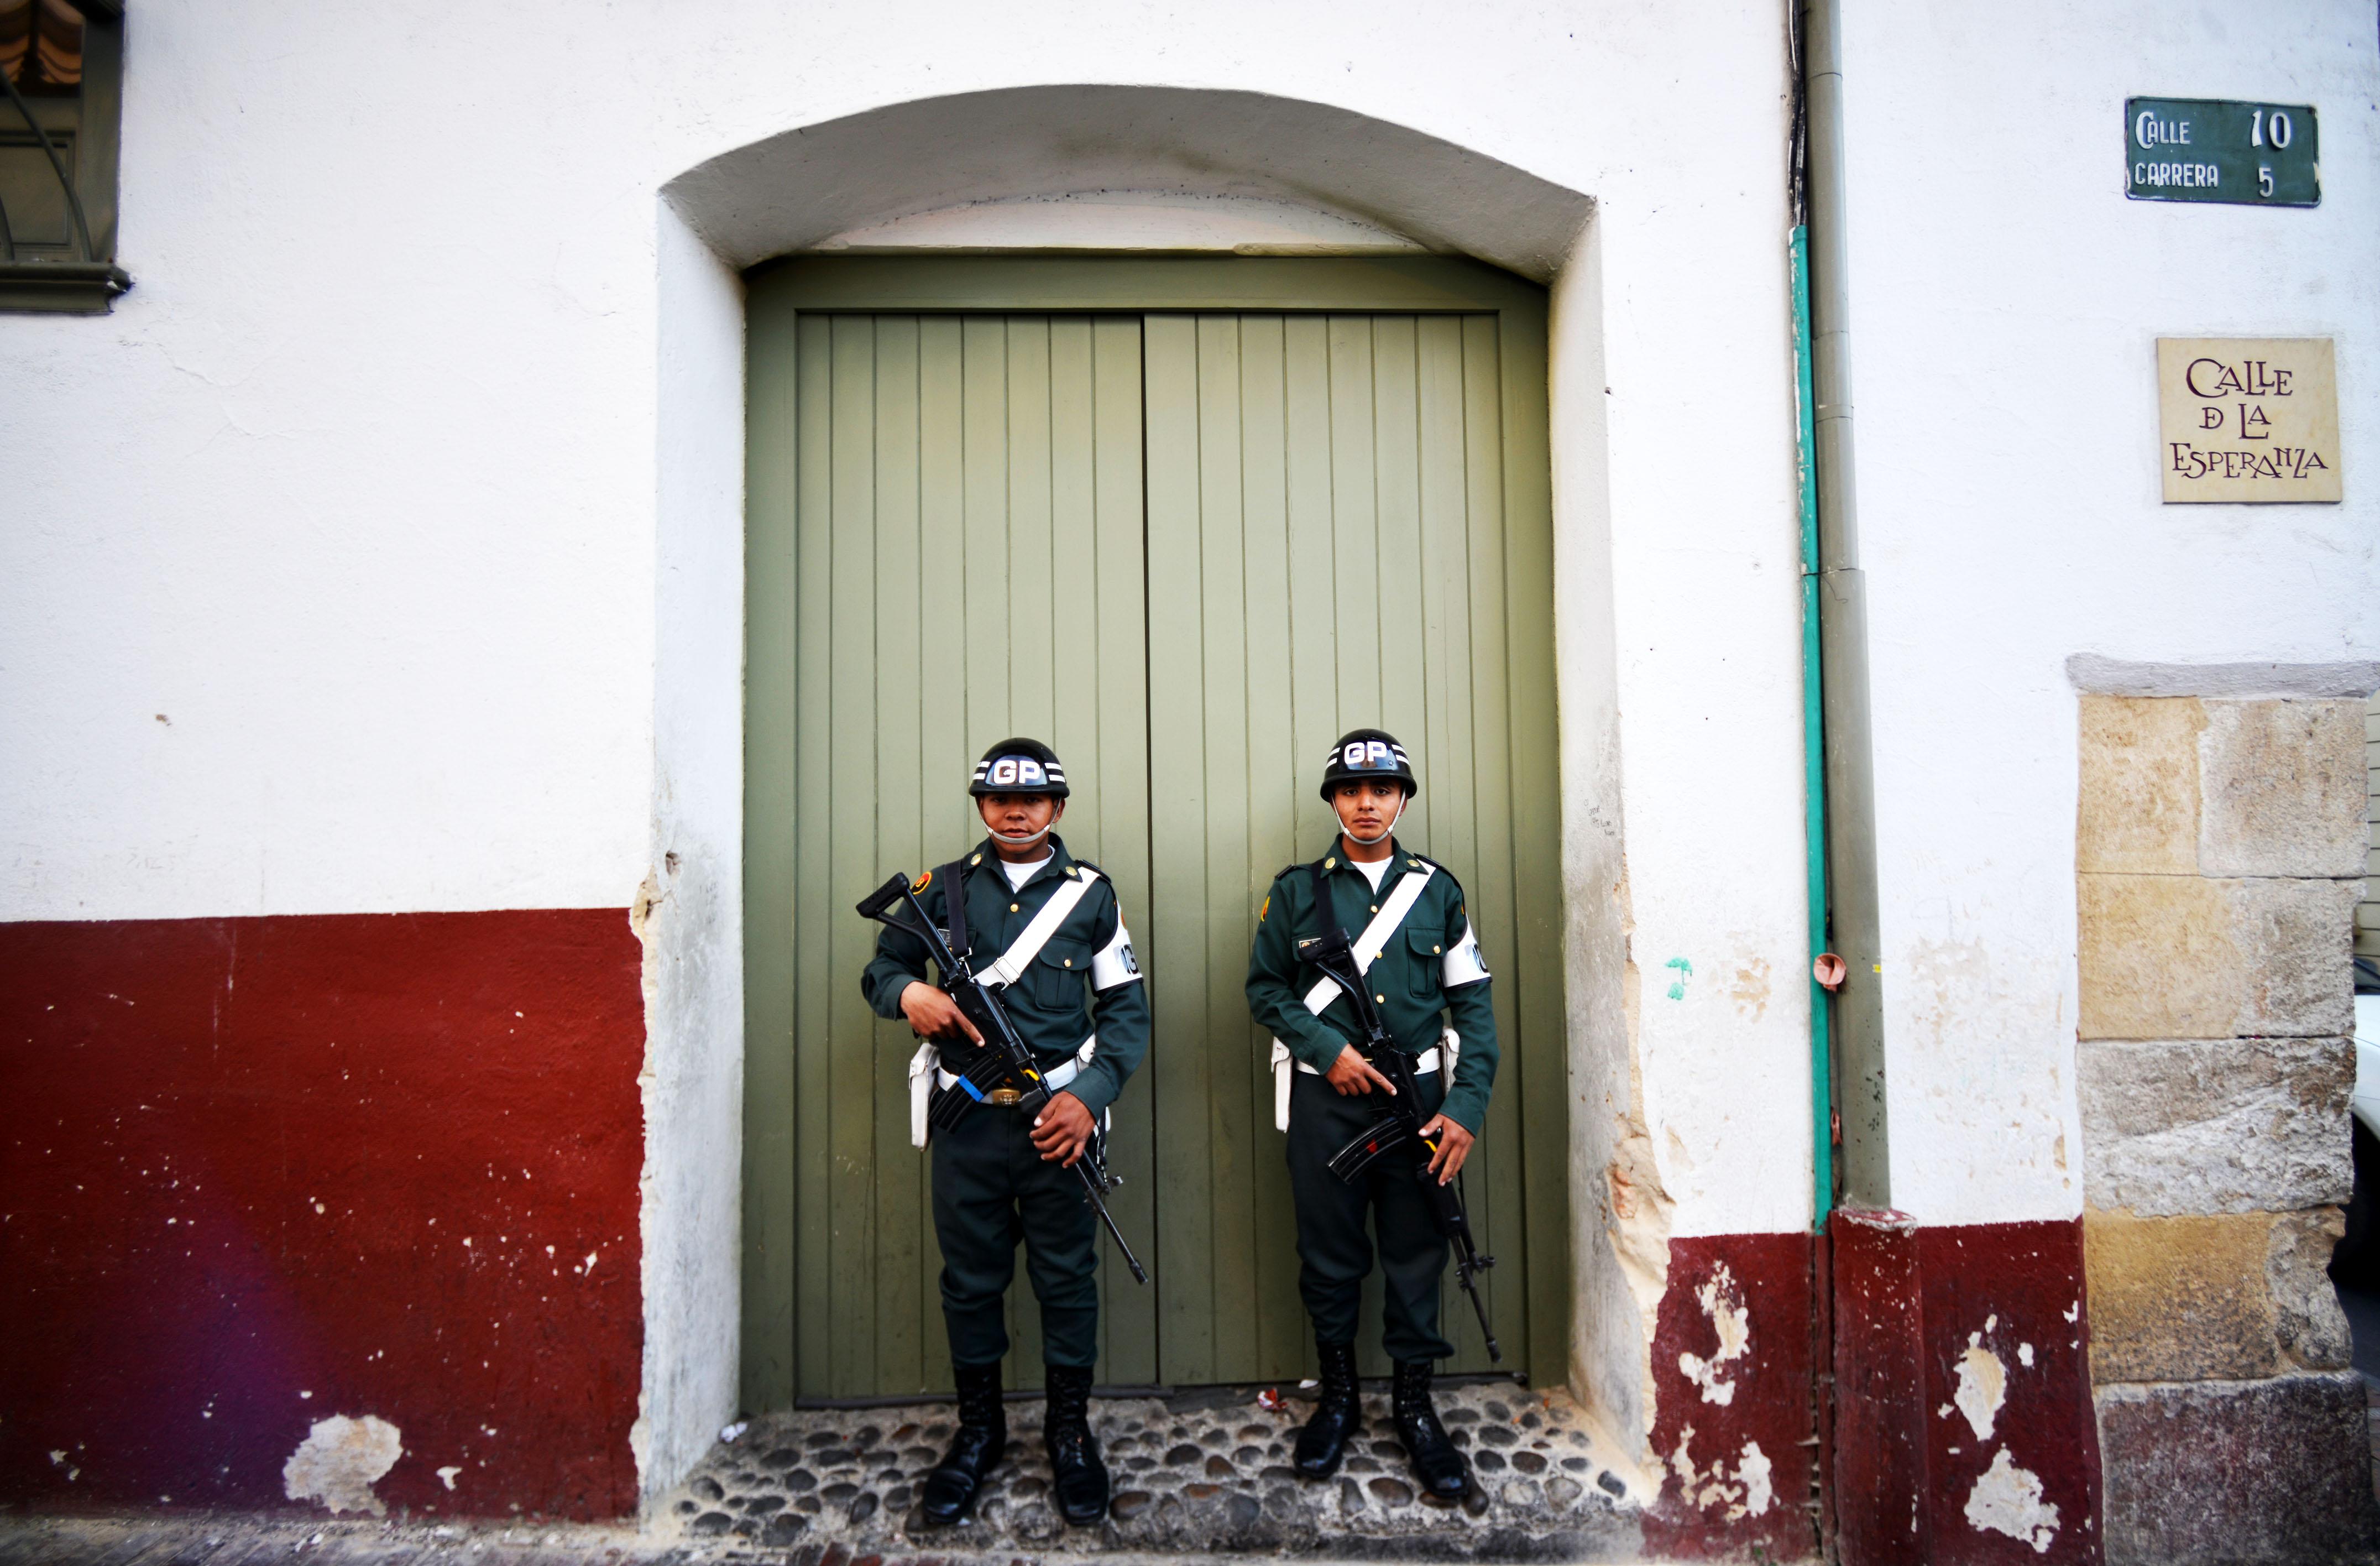 Soldados na zona antiga da cidade